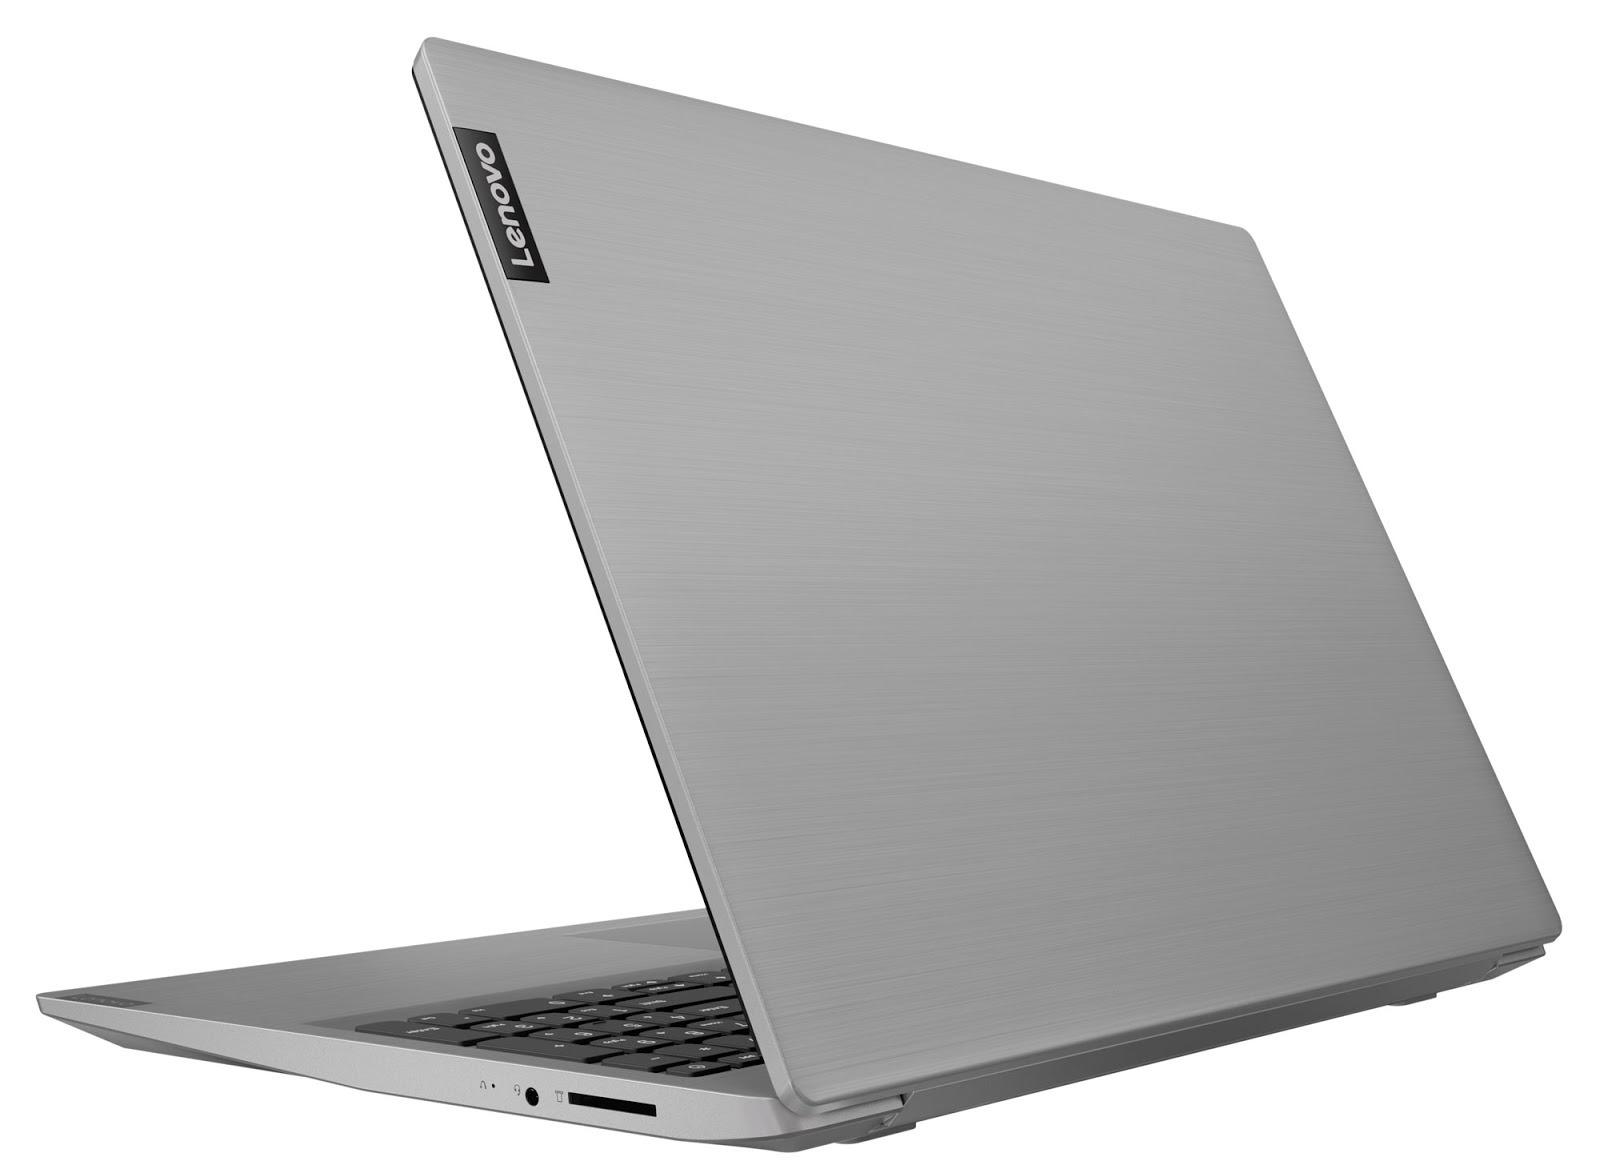 Фото 3. Ноутбук Lenovo ideapad S145-15IIL Platinum Grey (81W8007WRE)